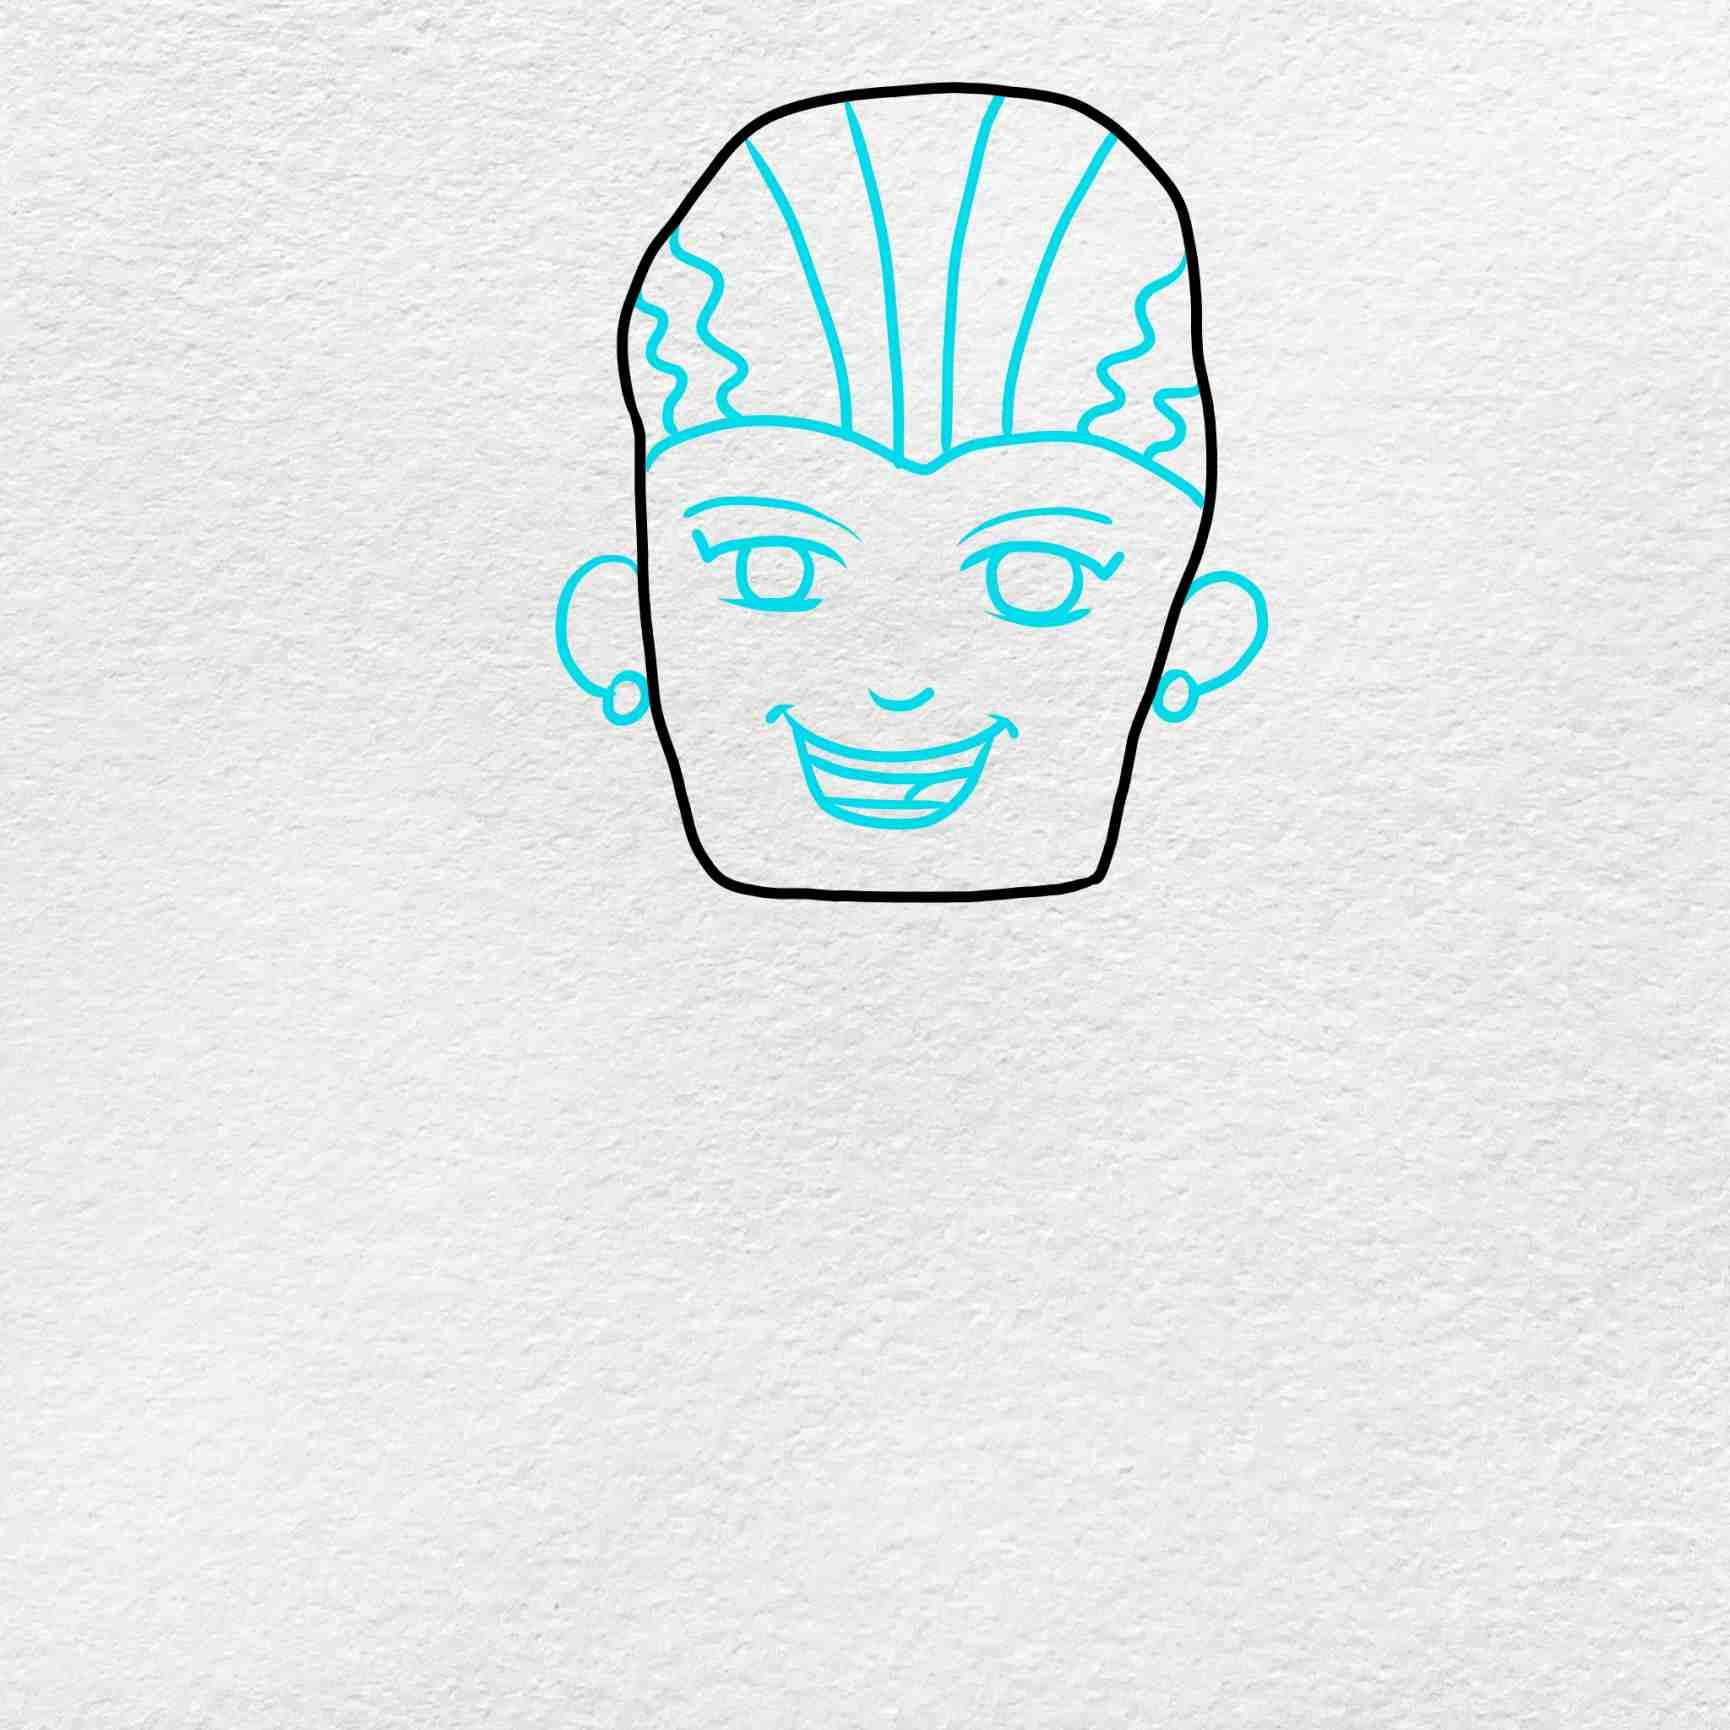 Bride Of Frankenstein Drawing: Step 2